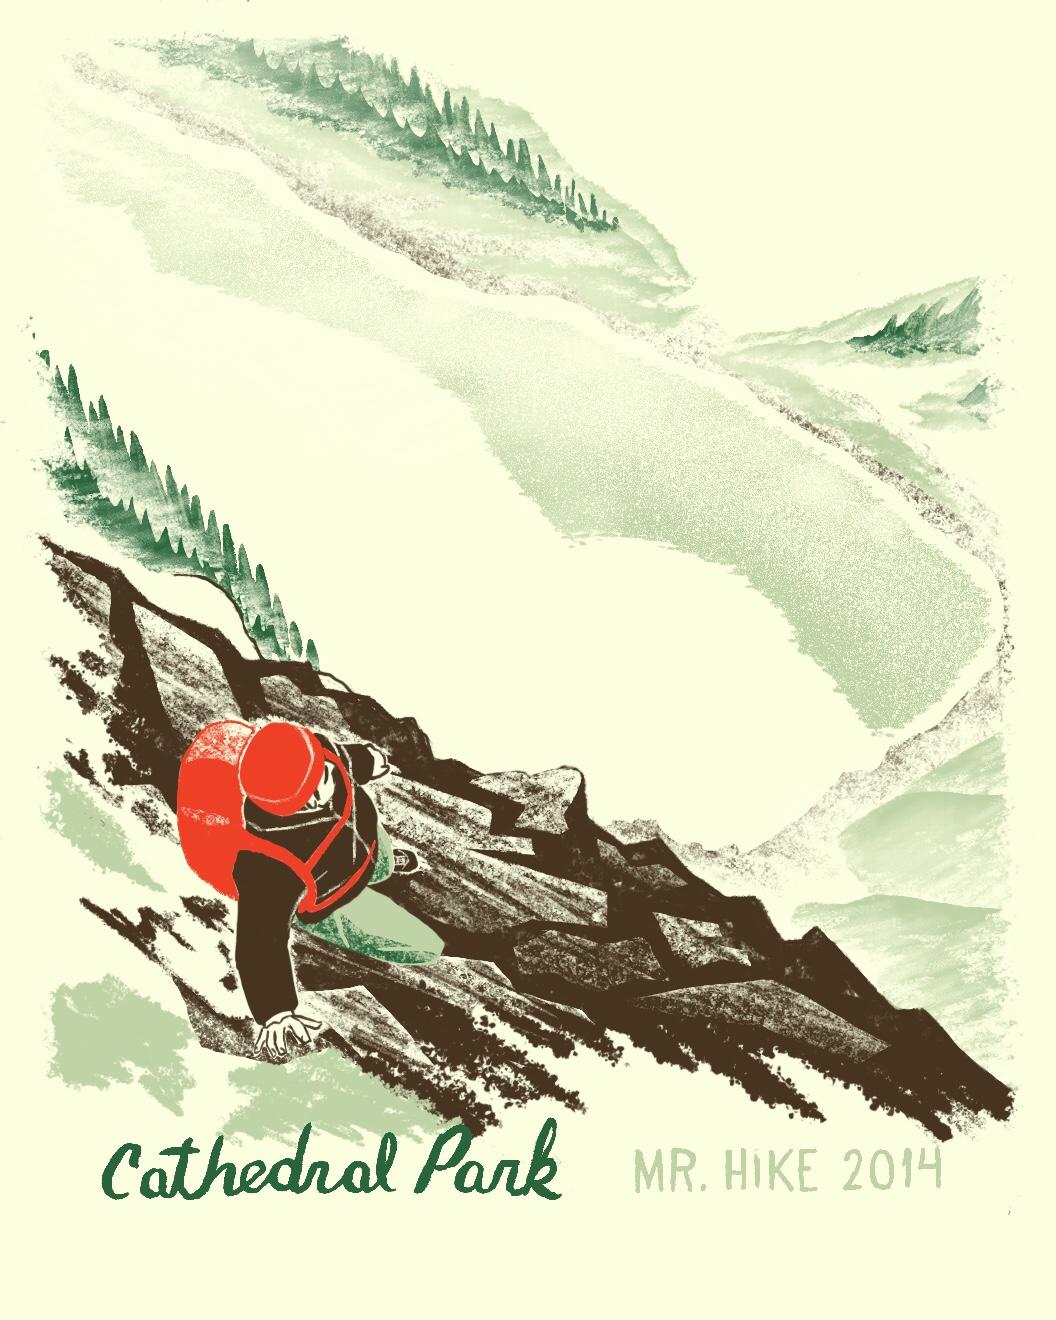 Cathedral Park hiking trip illustration